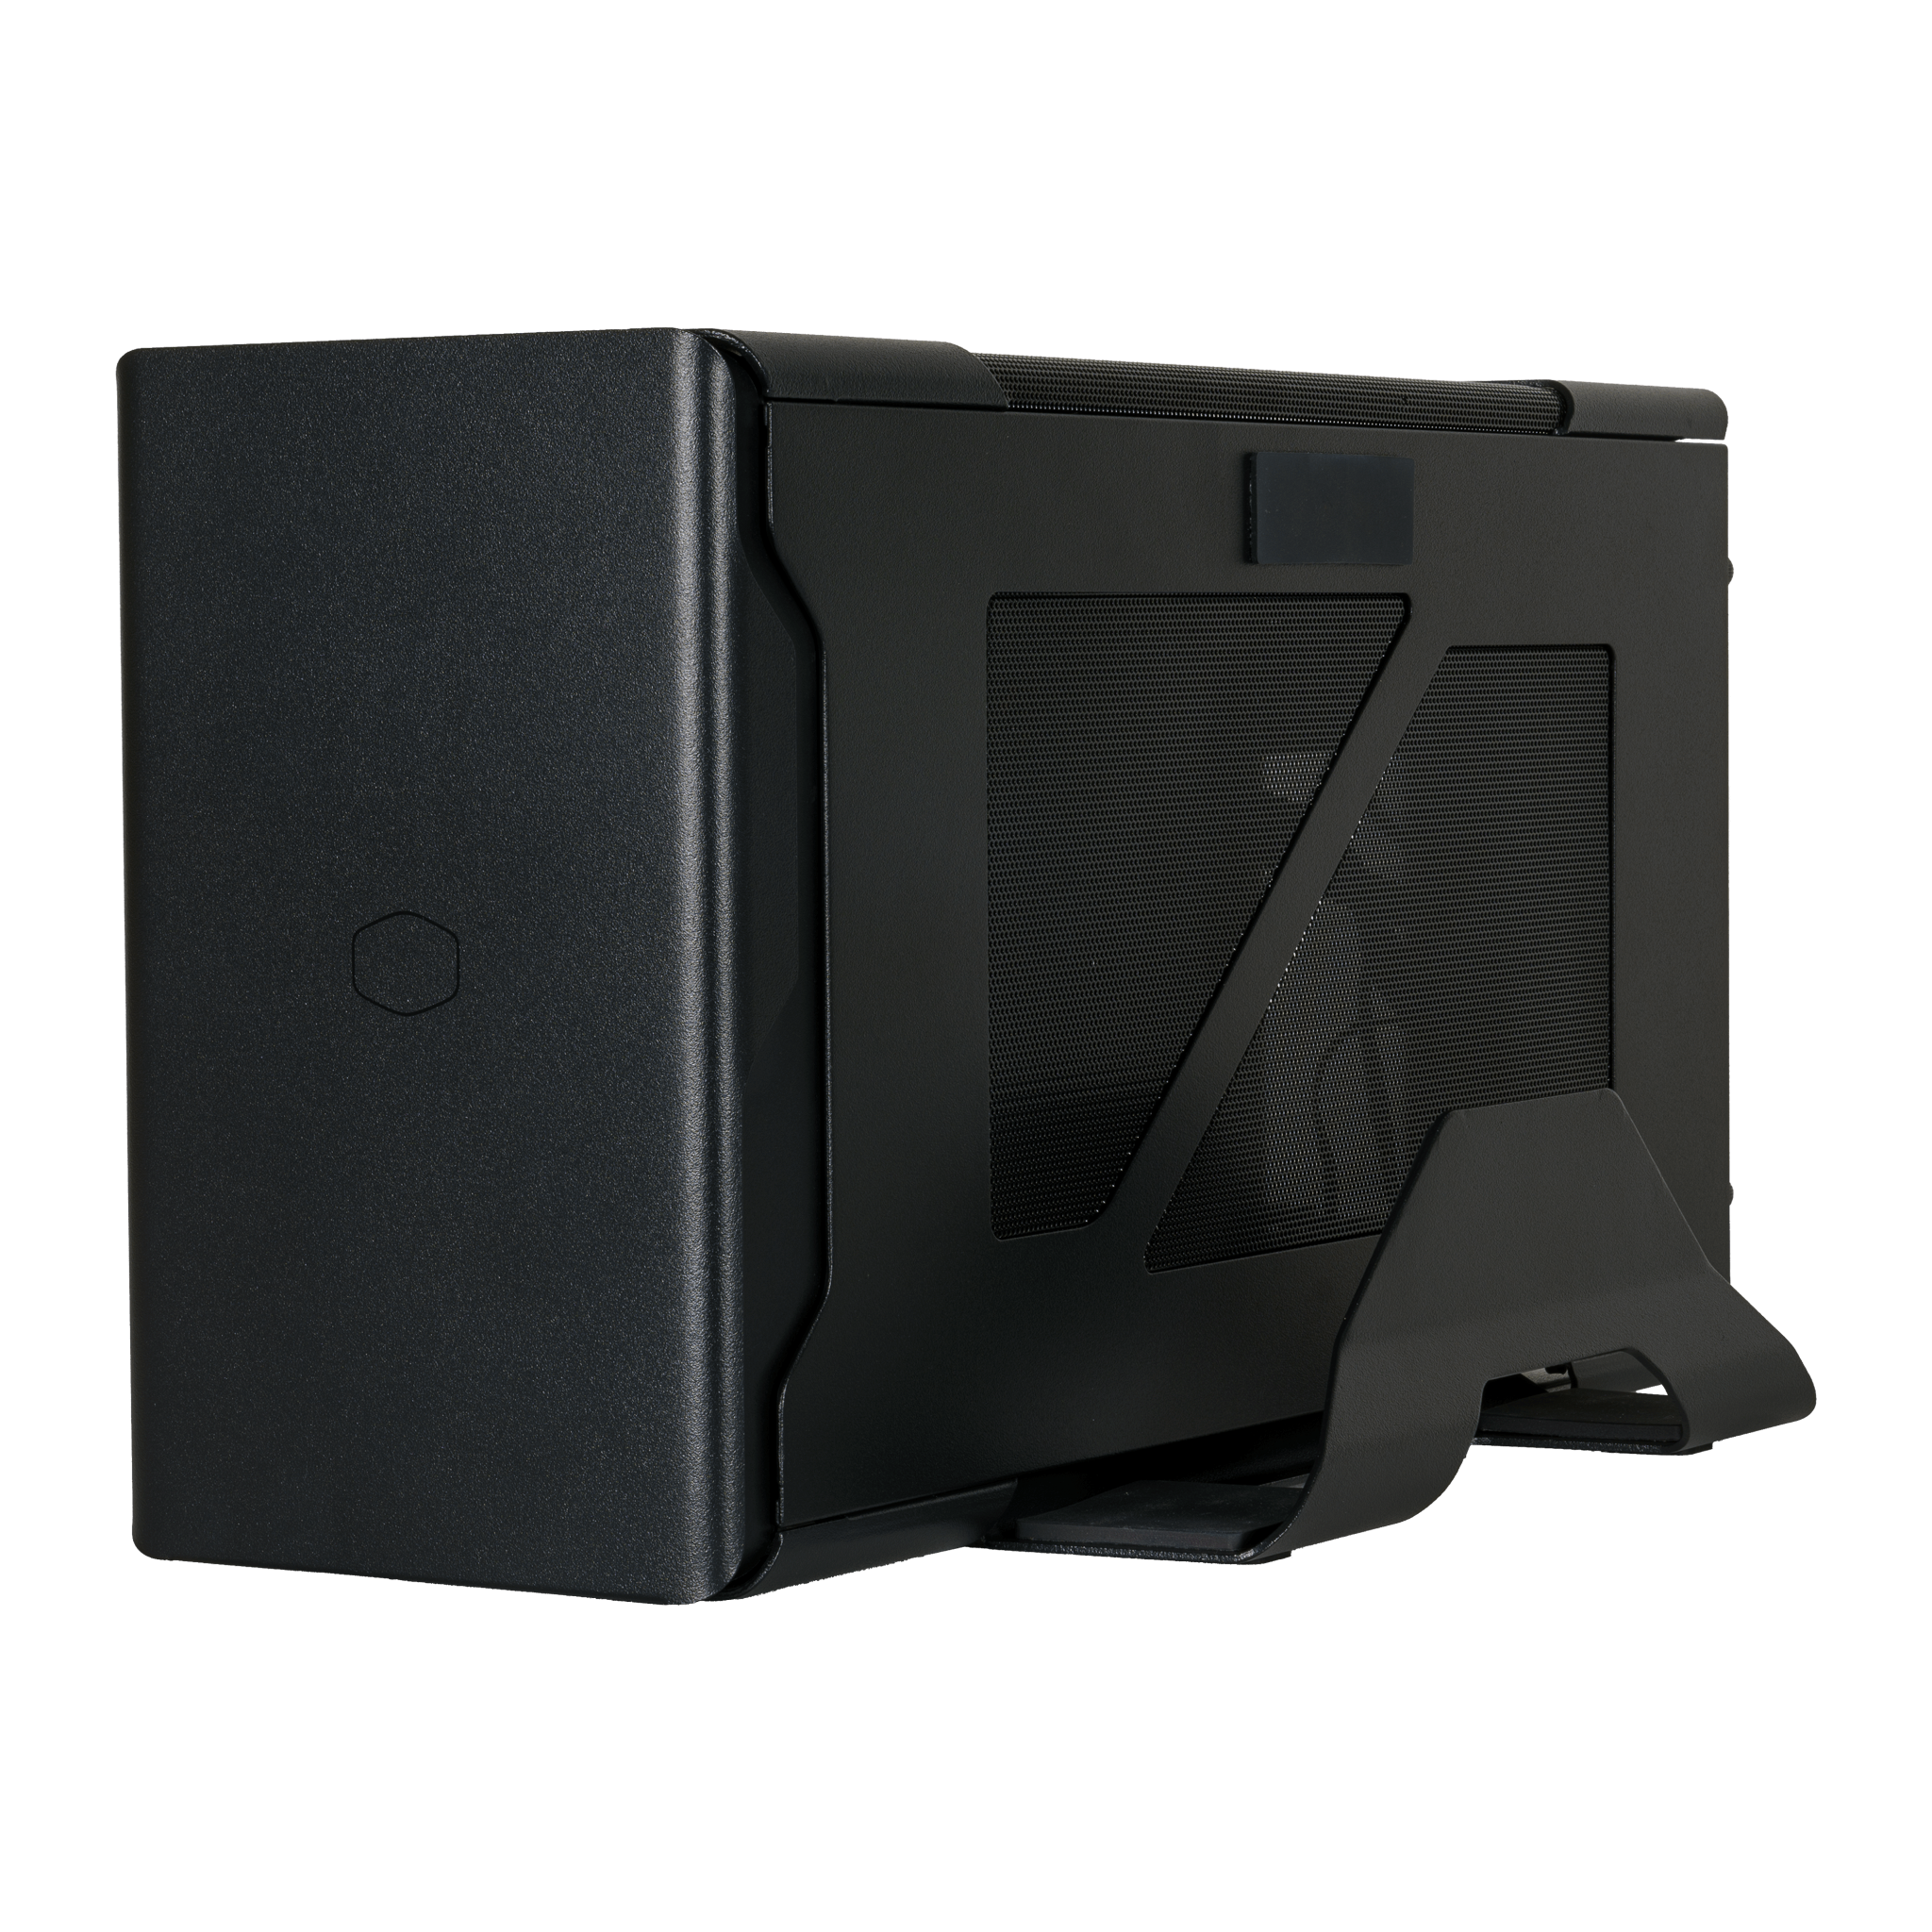 cooler master mastercase eg200 built-in USB hub and a hard drive dock